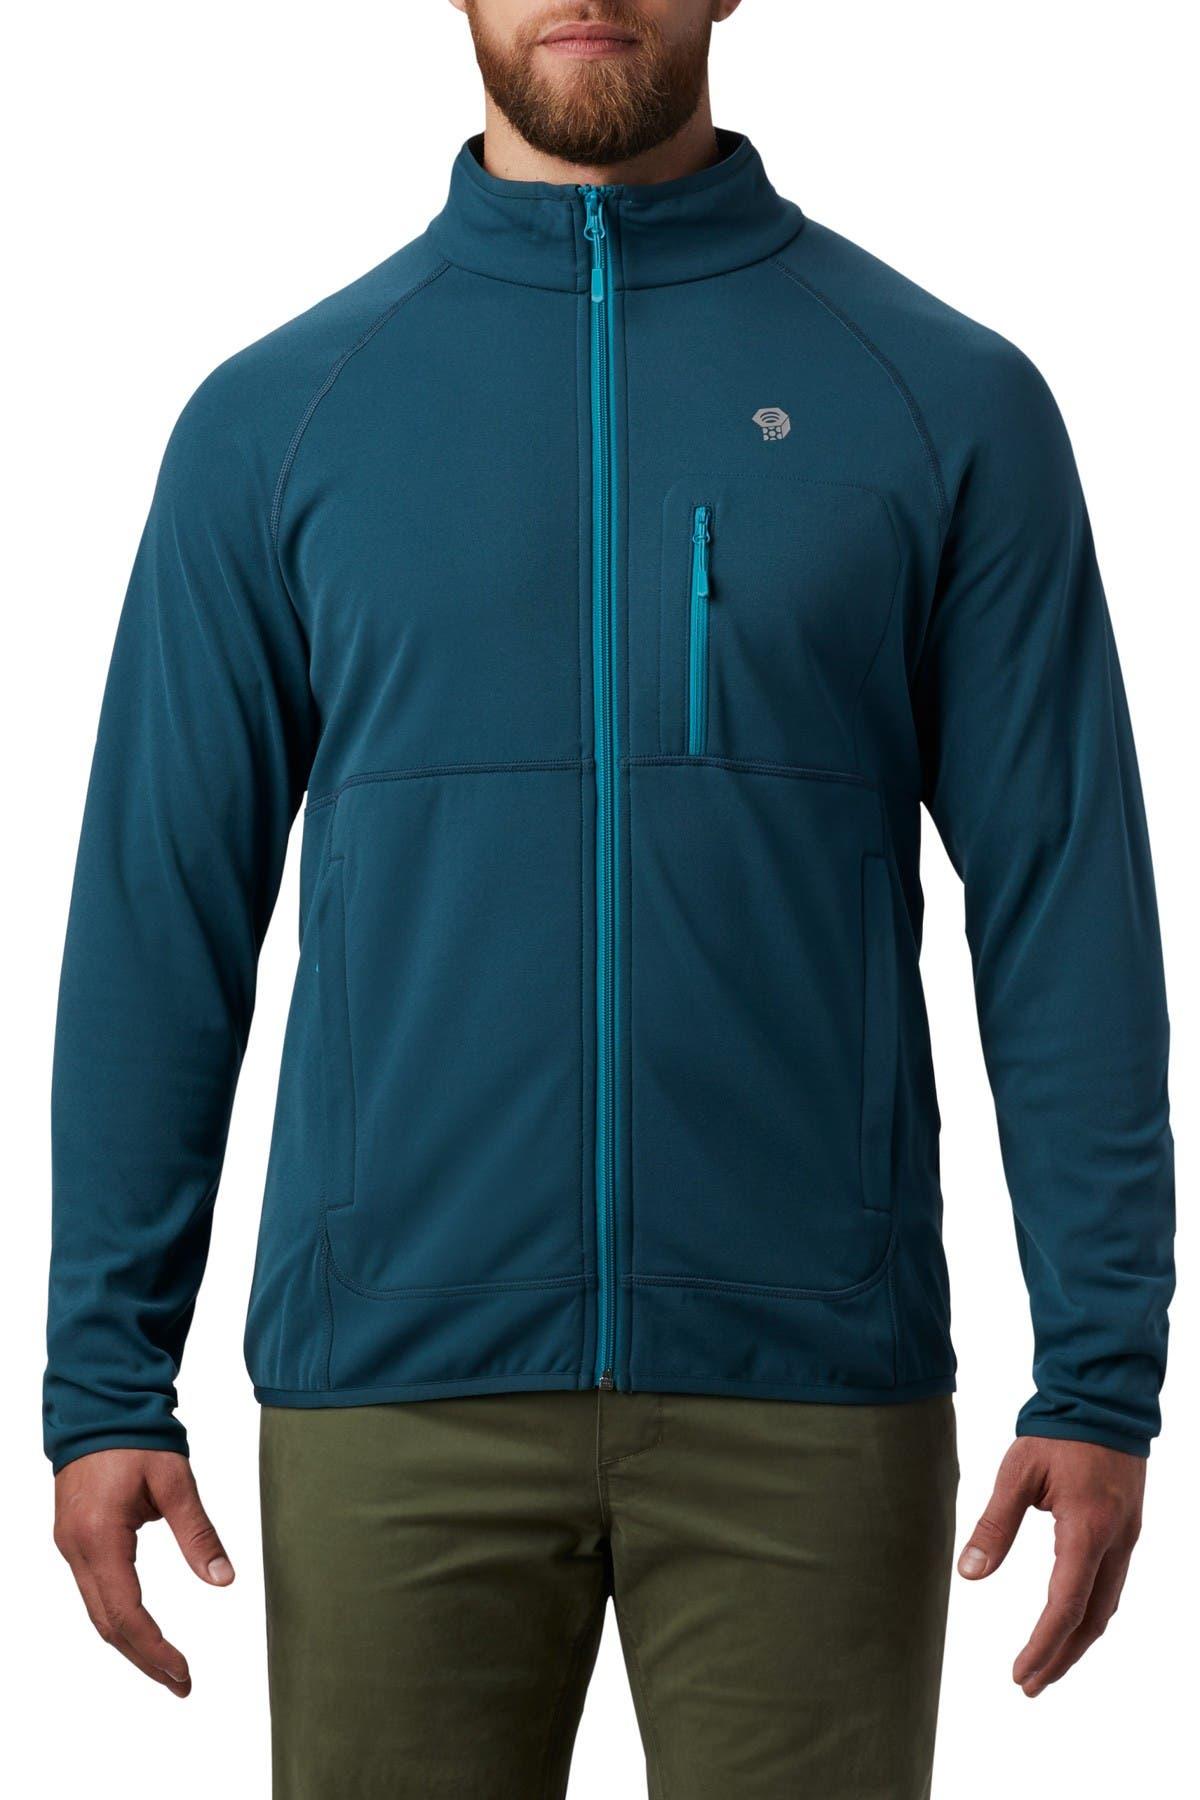 Image of MOUNTAIN HARDWEAR Norse Peak Full Zip Jacket